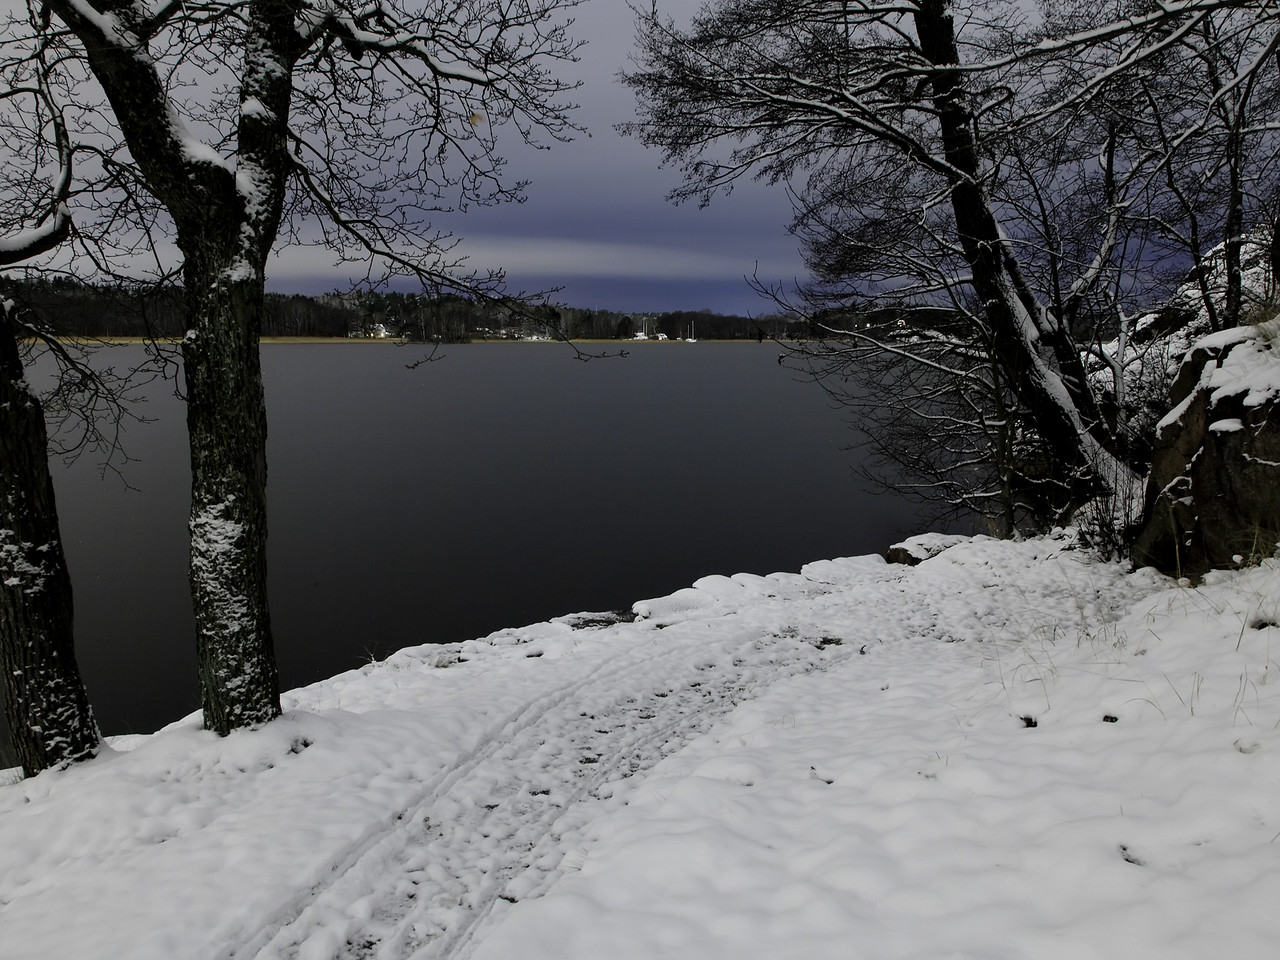 Beyond a pale winter night